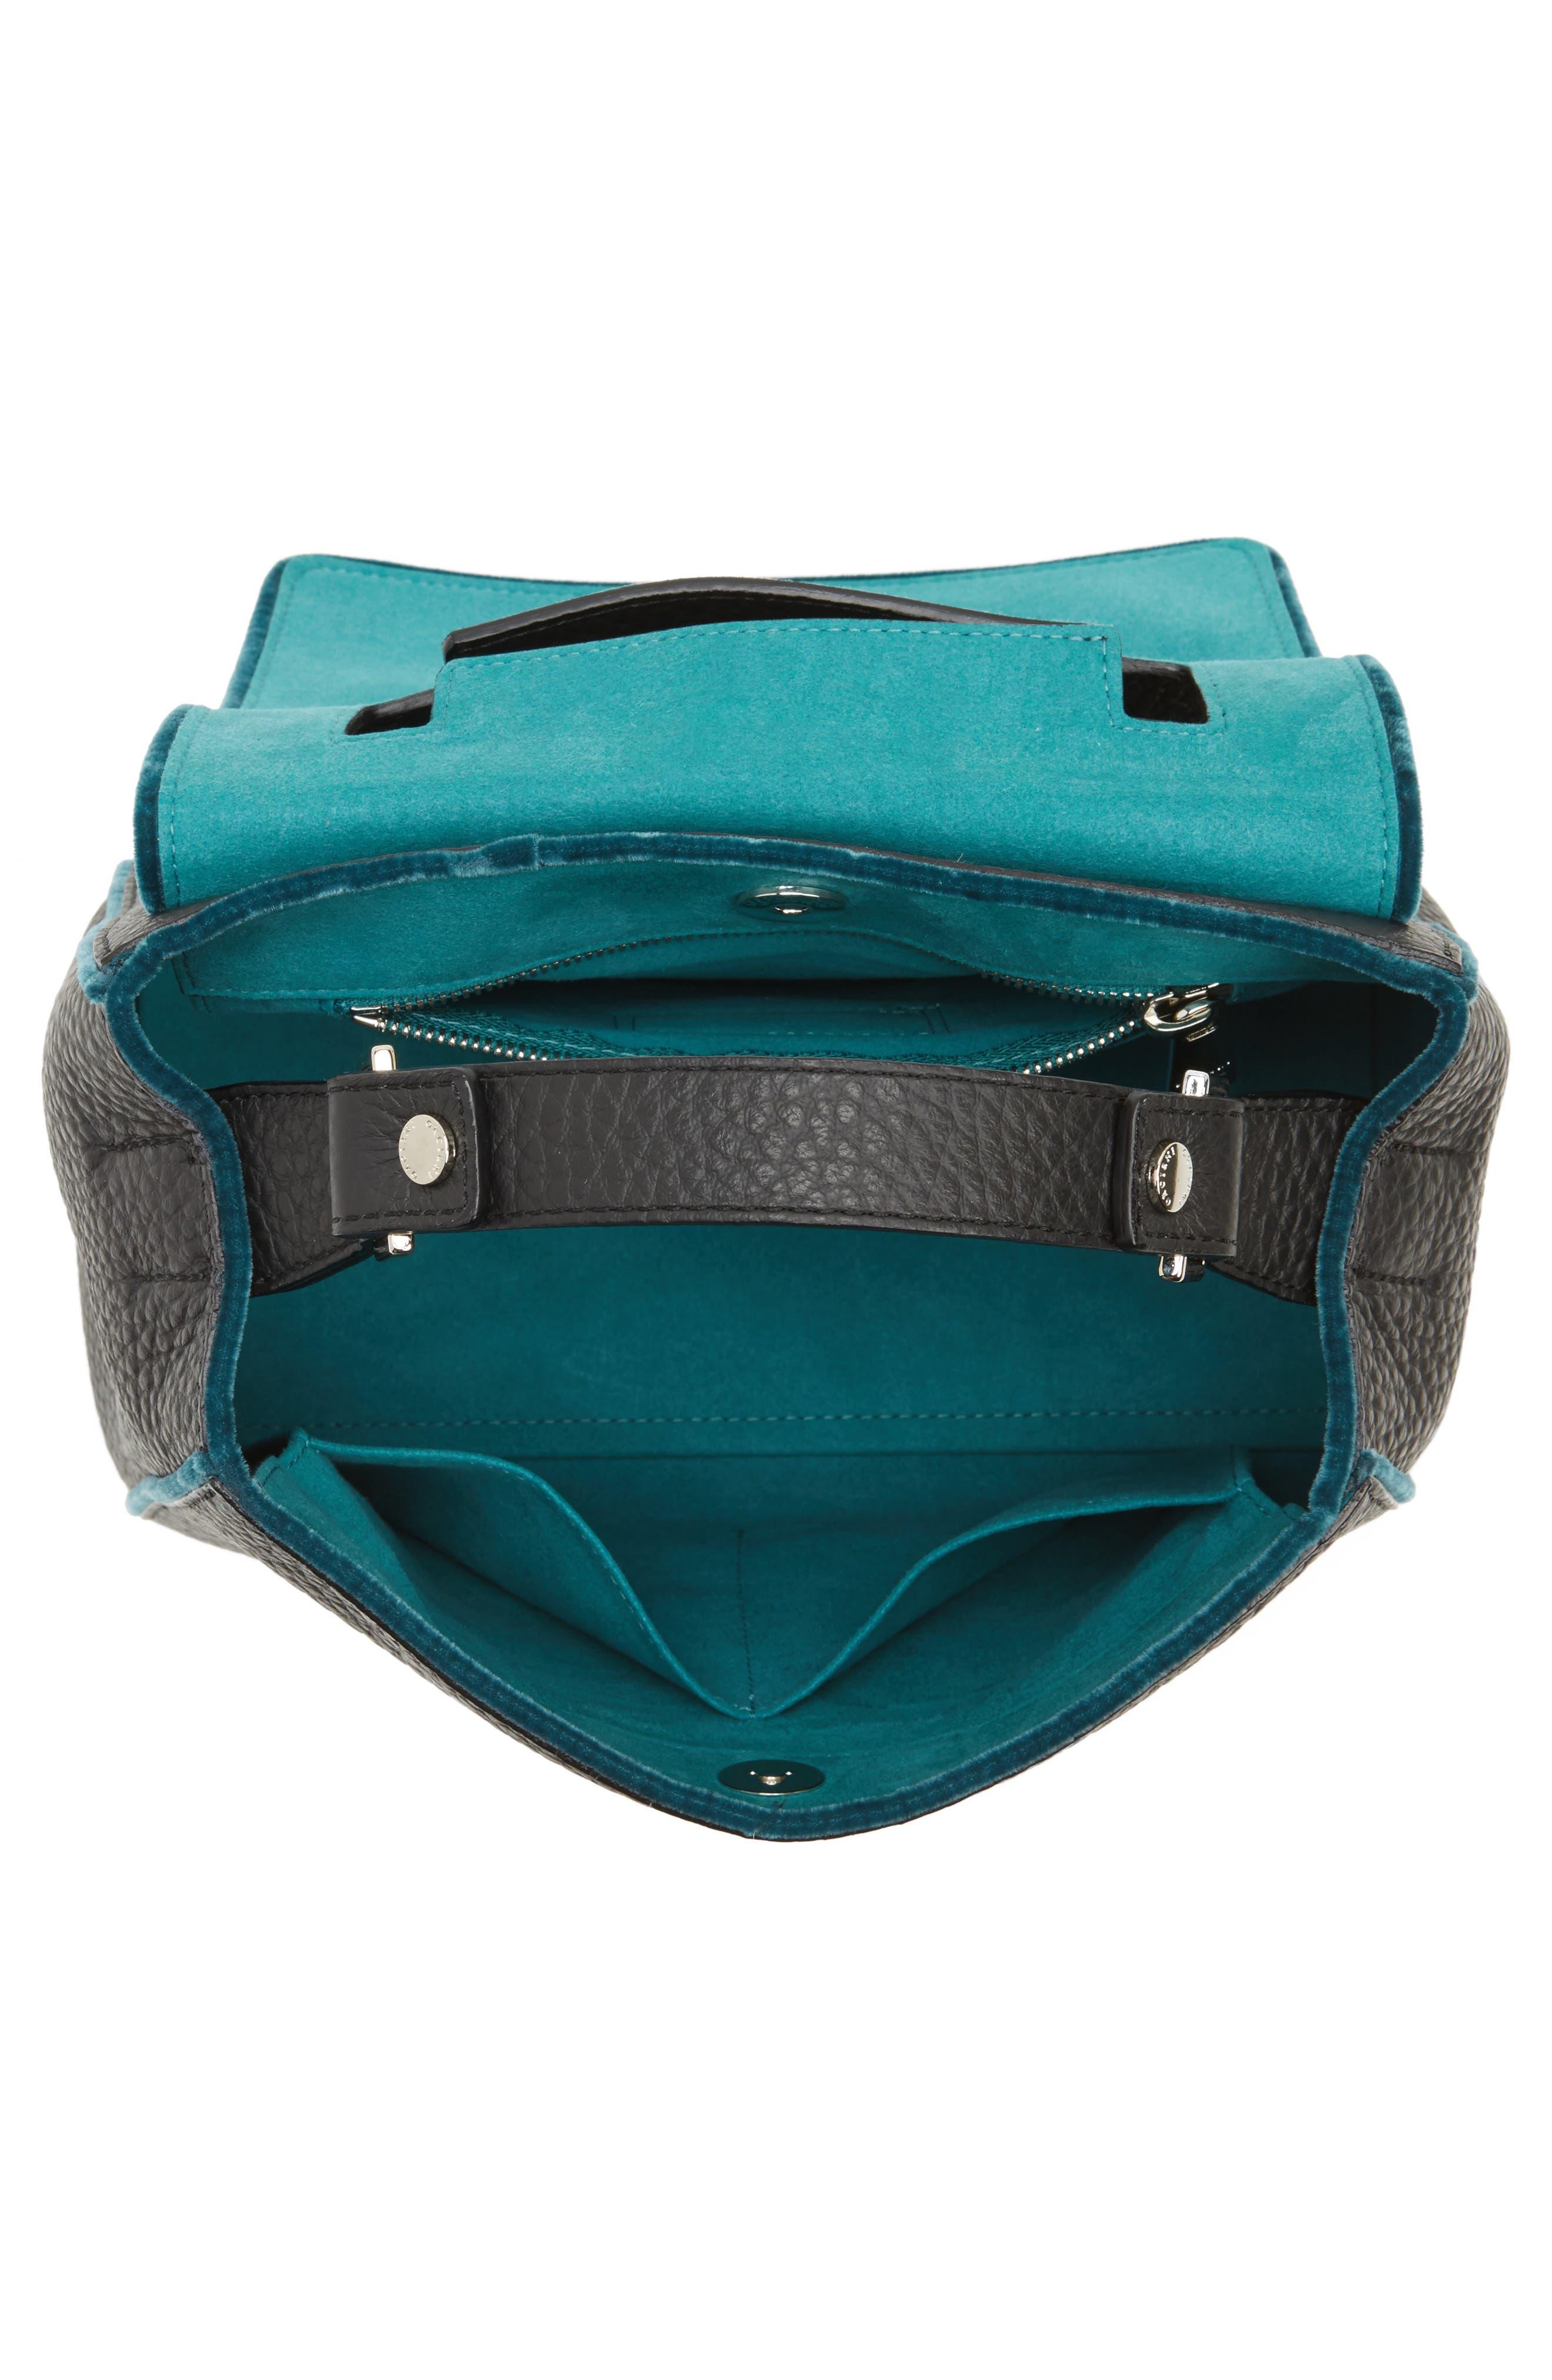 Small Sveva Soft Leather Top Handle Satchel with Genuine Fur Bag Charm,                             Alternate thumbnail 4, color,                             300